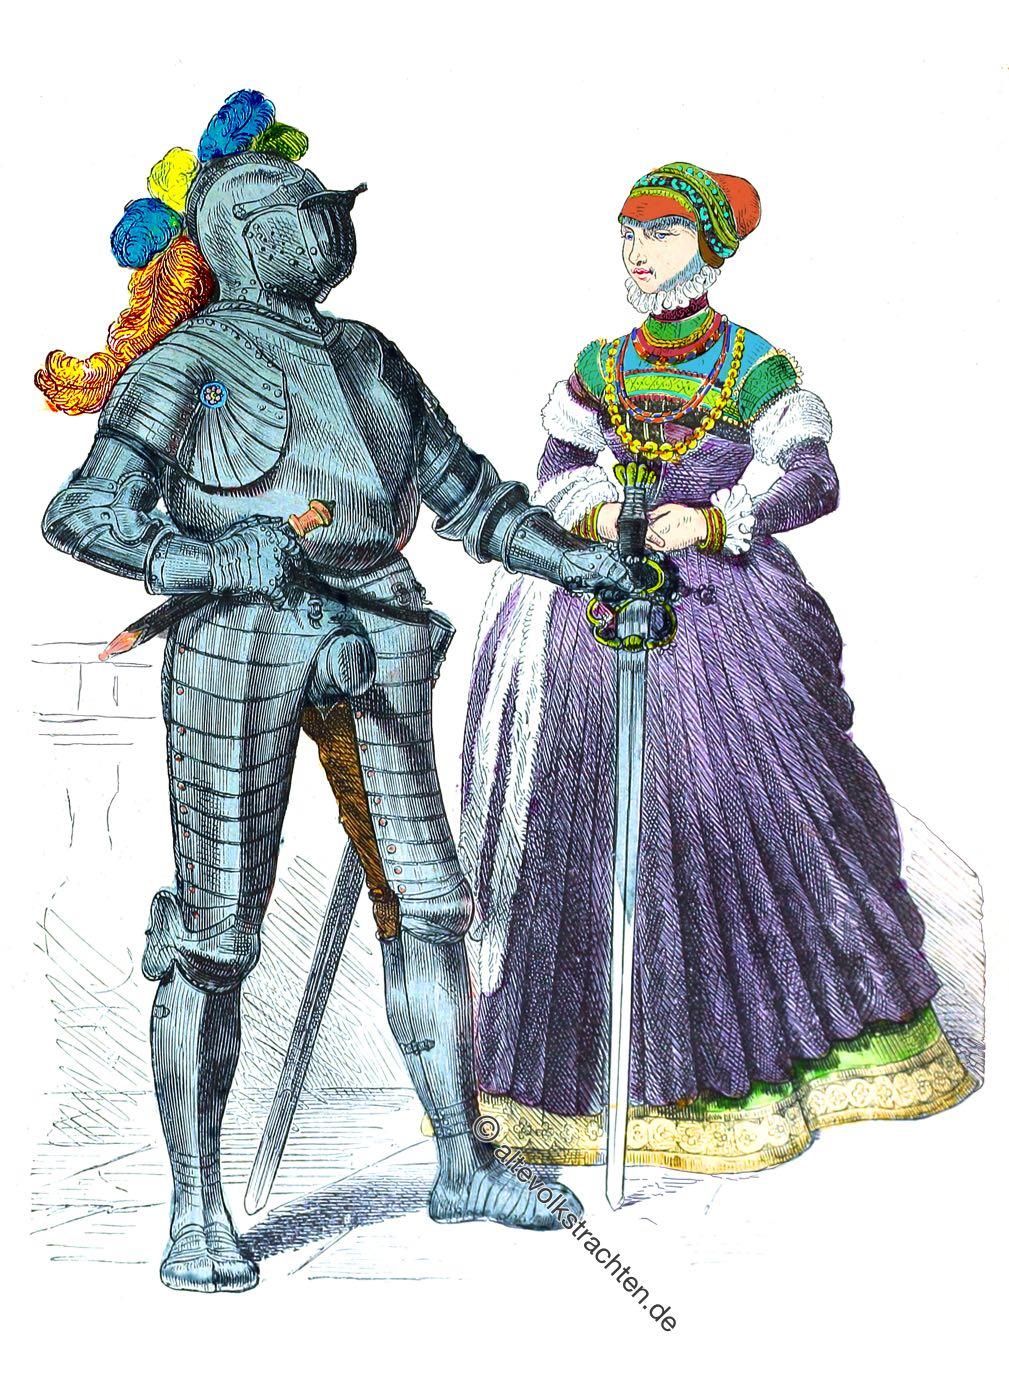 Ritter, Edelfrau, Gewandung, Kostüme, Mittelalter, Renaissance, Mode, Münchener Bilderbogen